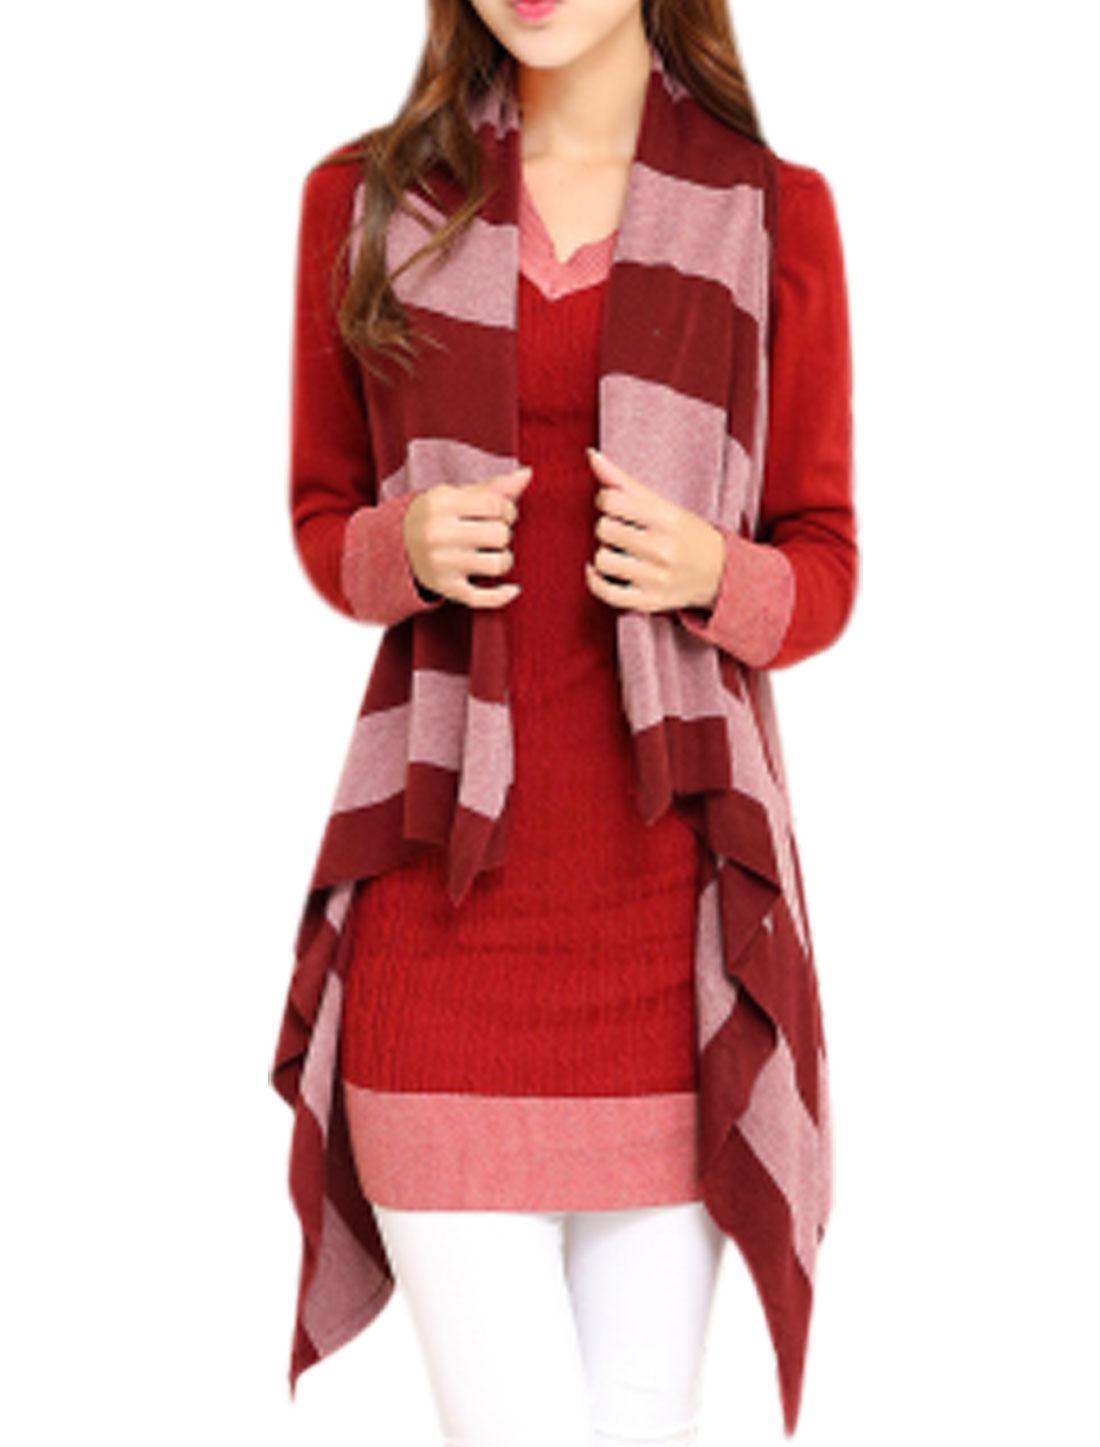 Ladies Draped Hem Contrast Color Sleeveless Knitting Vest Burgundy XS